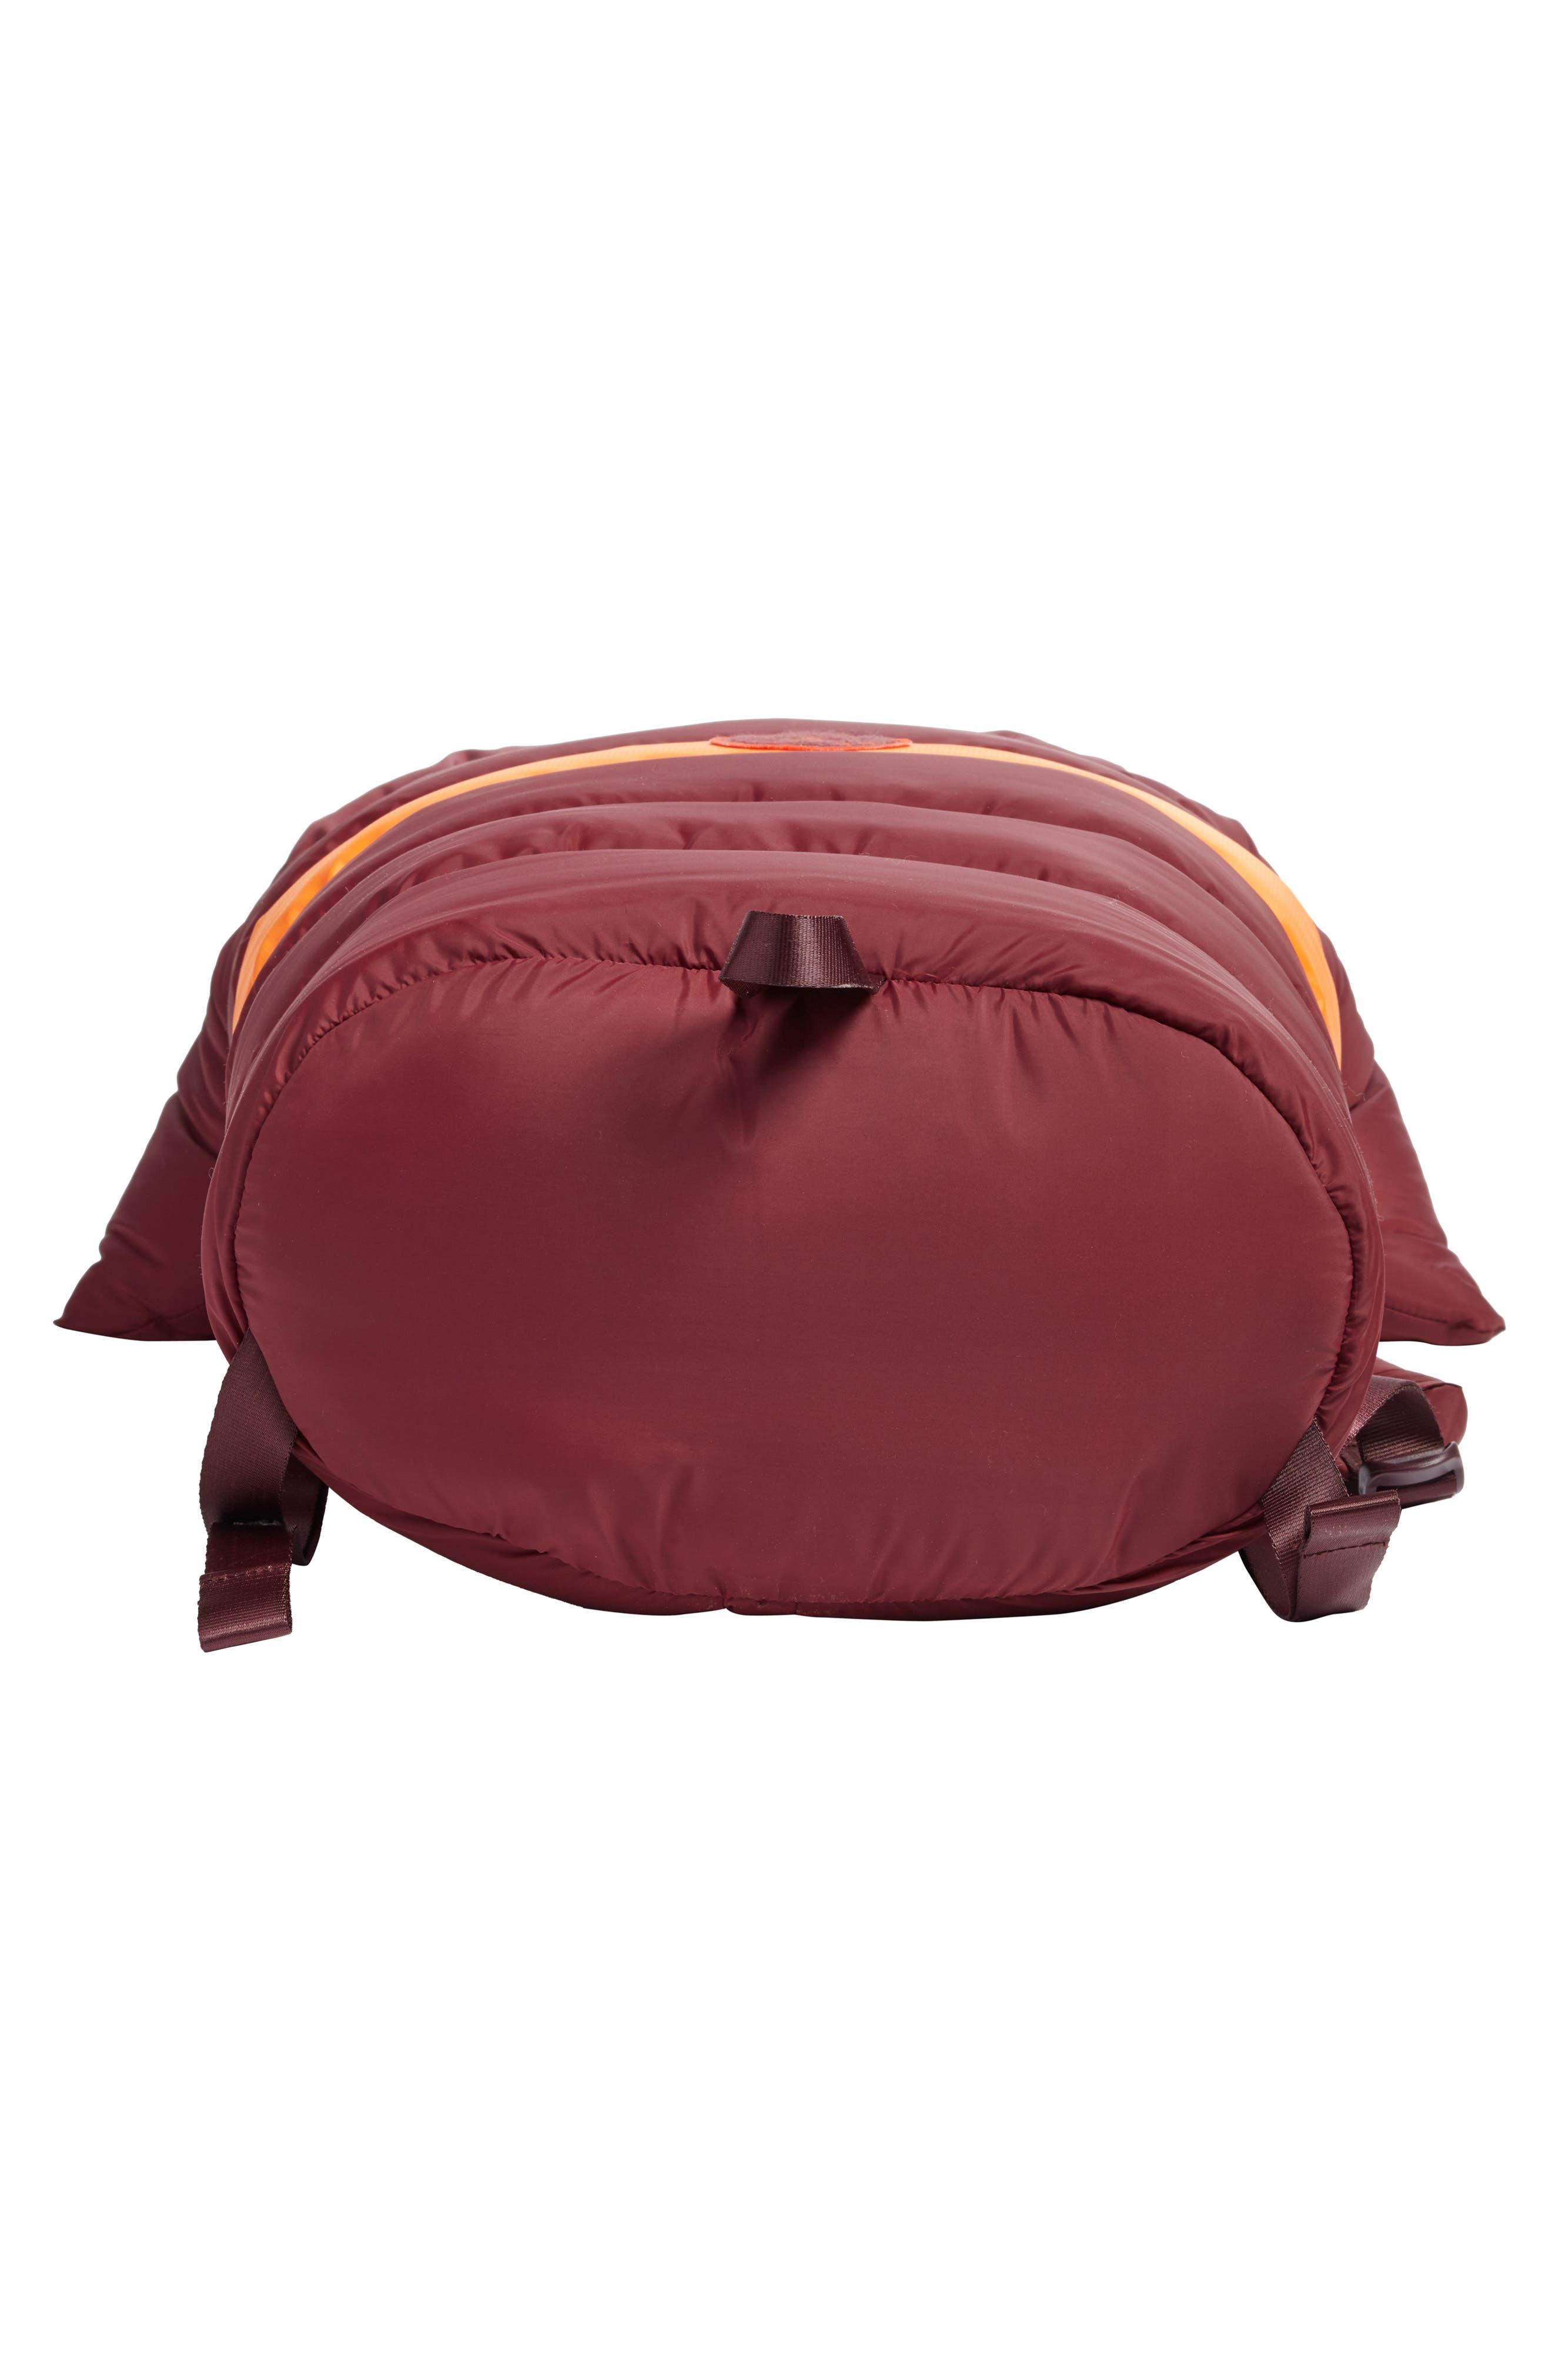 PUMA by Rihanna Backpack,                             Alternate thumbnail 6, color,                             Burgundy Orange